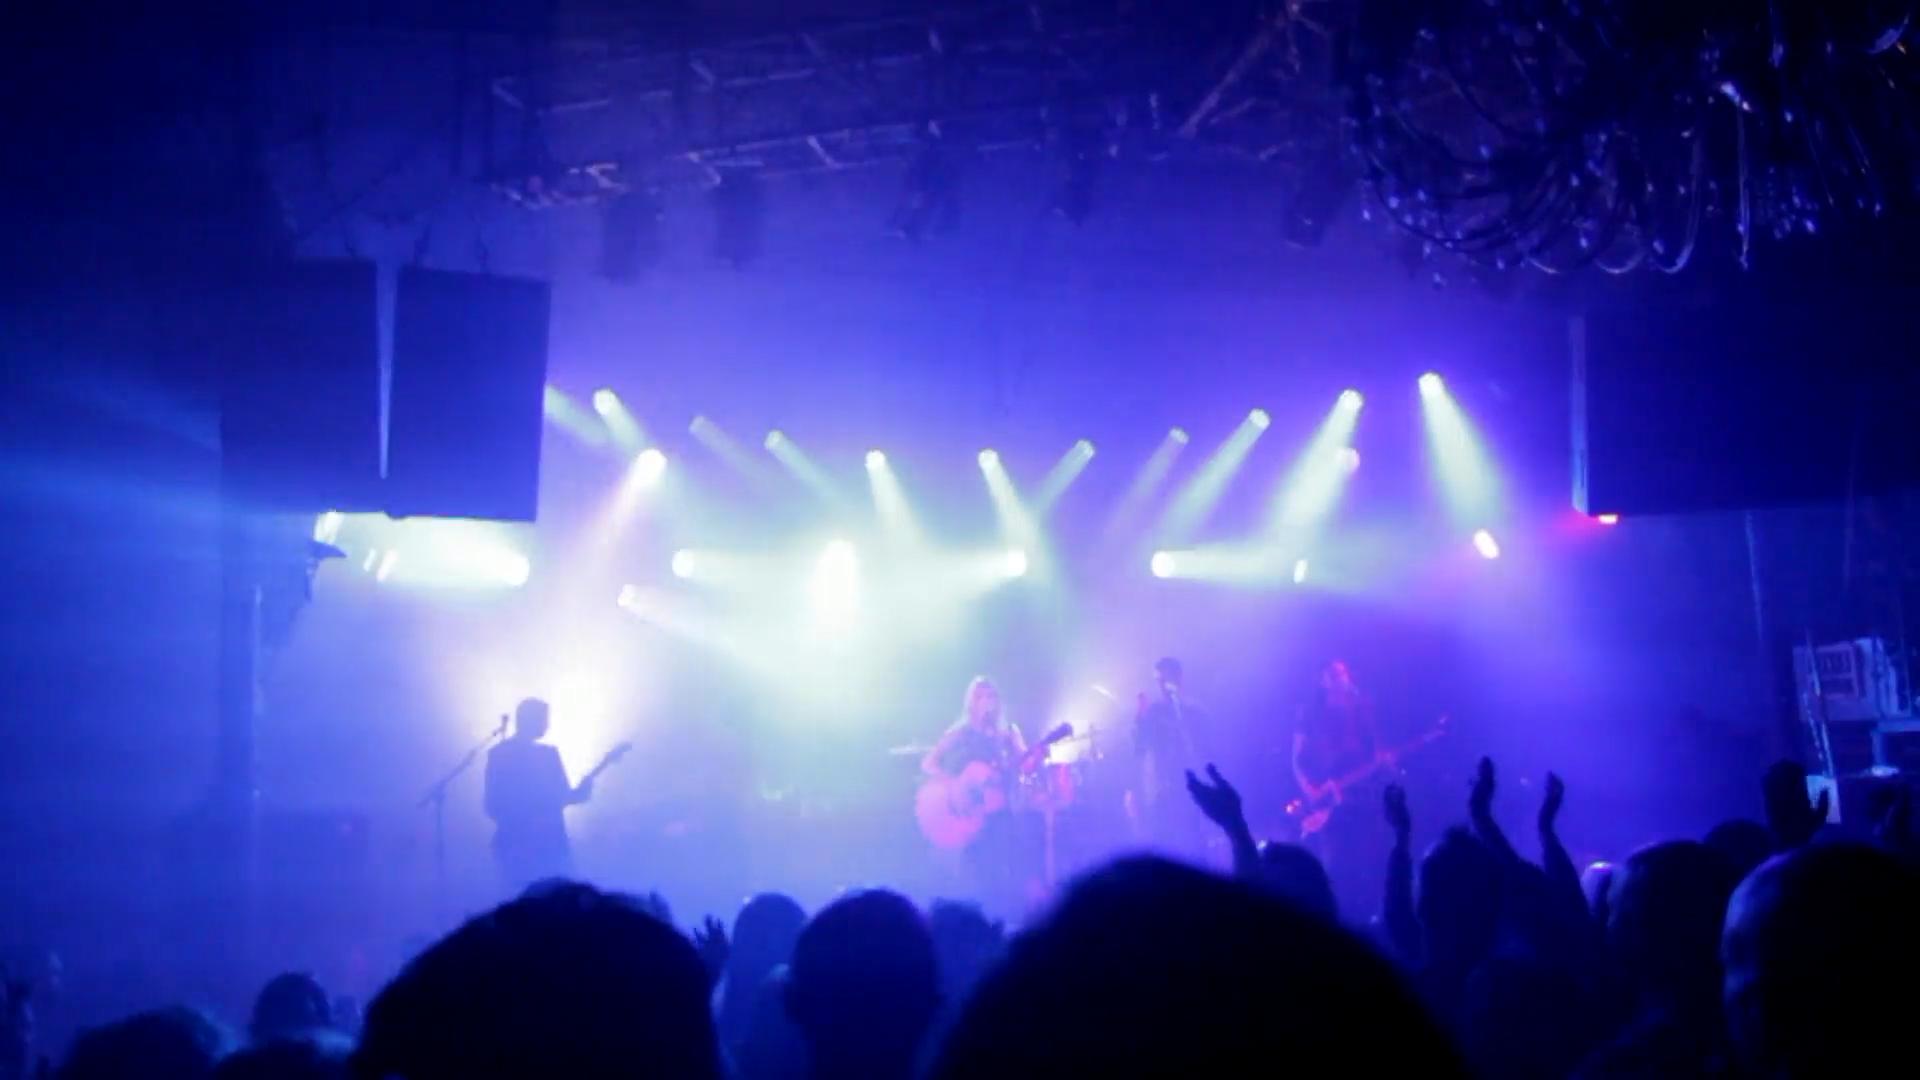 Concert - 1630.00_00_02_25.Still002.png